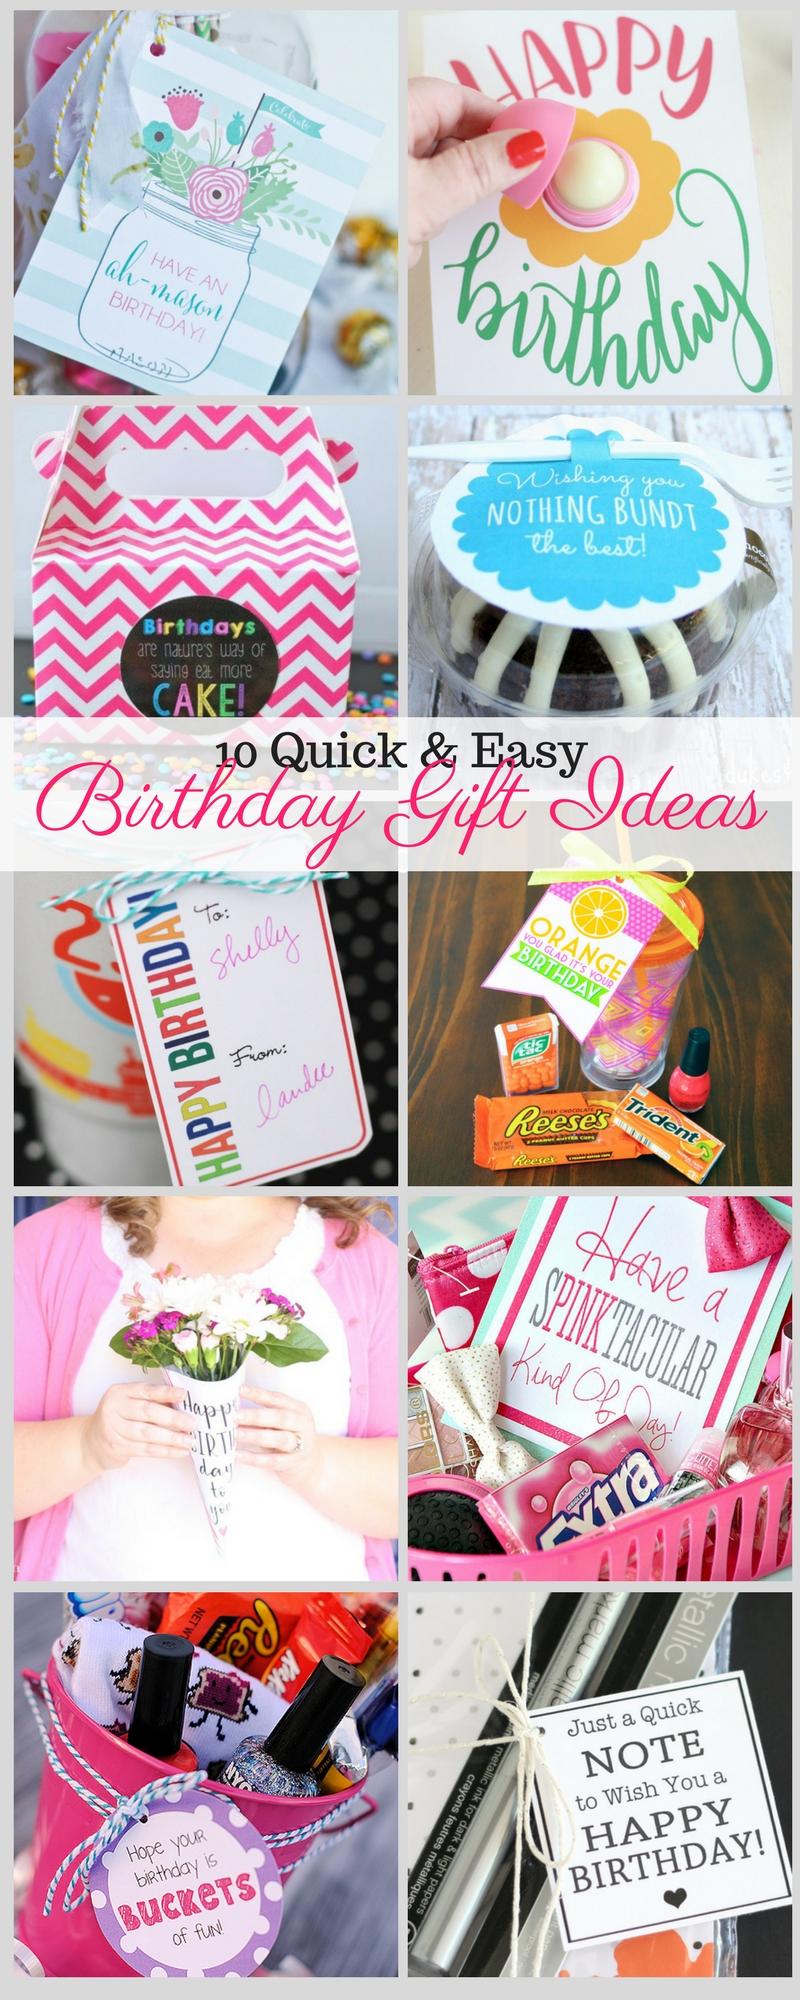 Best Friend Female Easy Birthday Gift Ideas For B Image Not